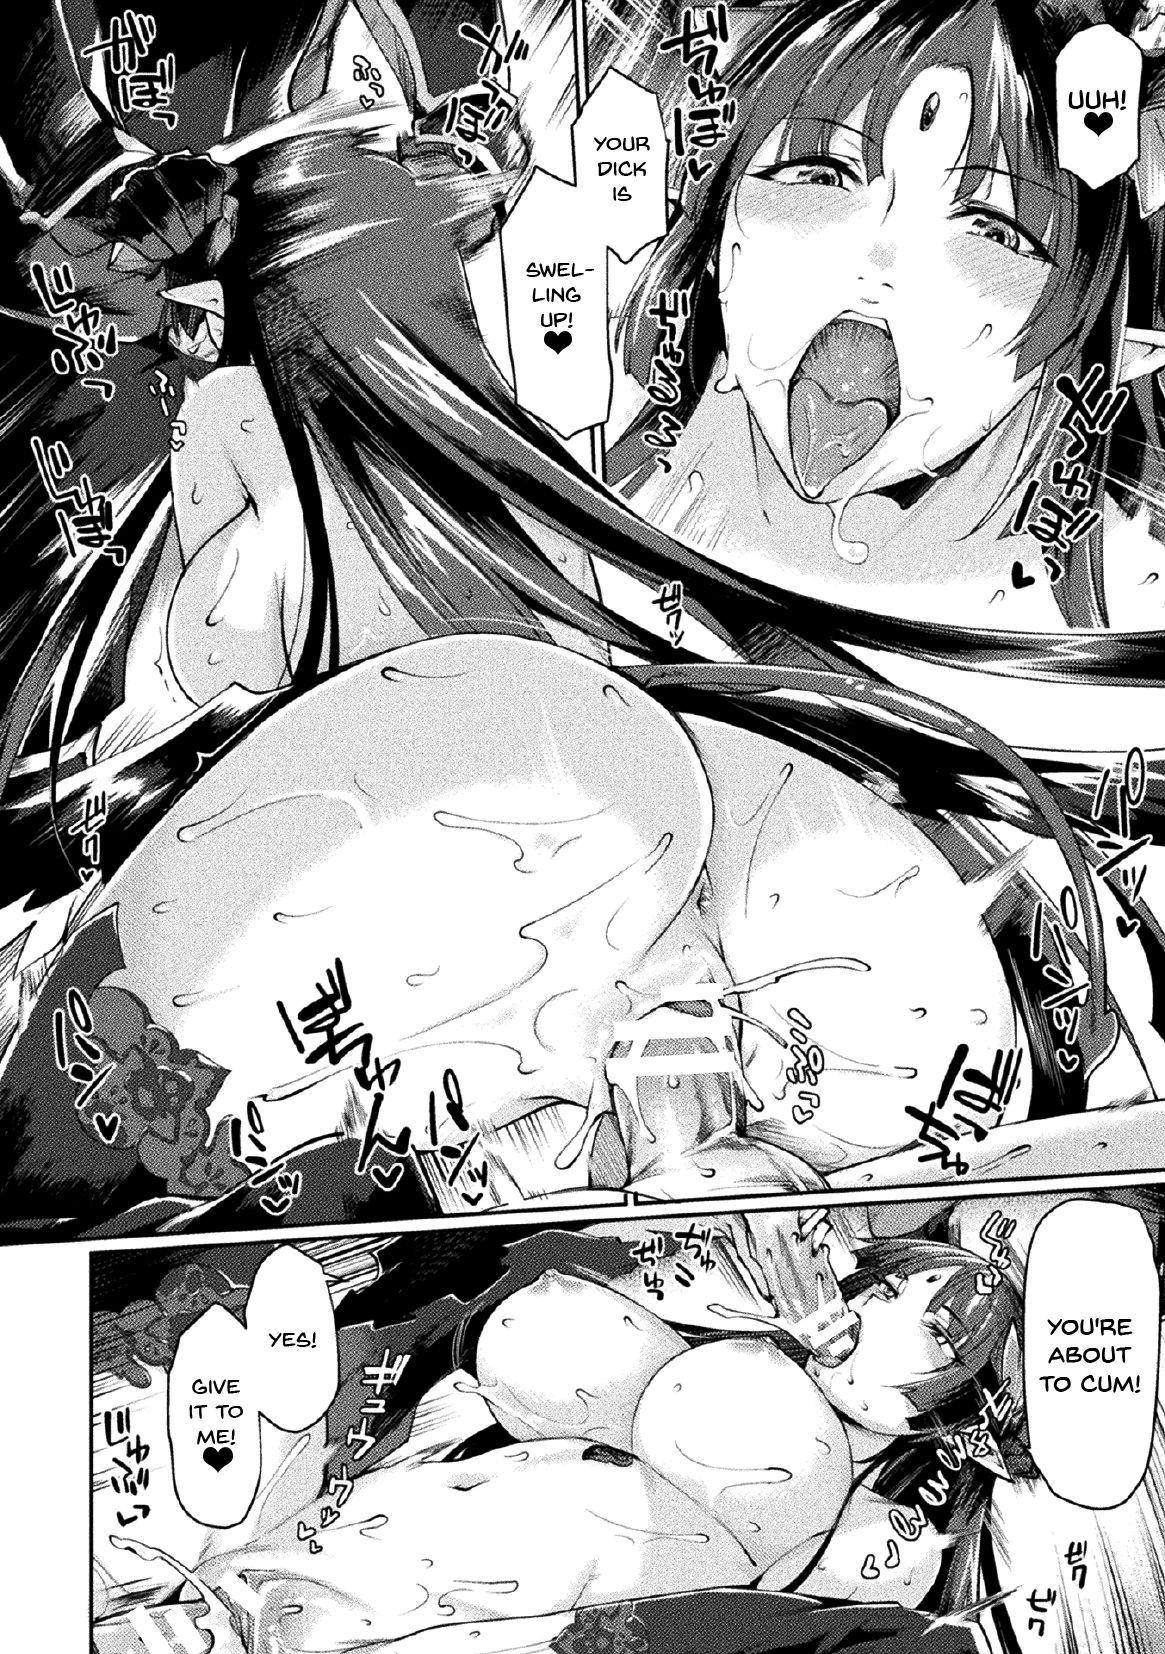 [Tsukitokage] Kuroinu II ~Inyoku ni Somaru Haitoku no Miyako, Futatabi~ THE COMIC | Kuroinu II ~Corrupted Town Stained With Lust~ THE COMIC Ch. 1 (Haiboku Otome Ecstasy Vol. 17) [English] {Doujins.com} [Digital] 13